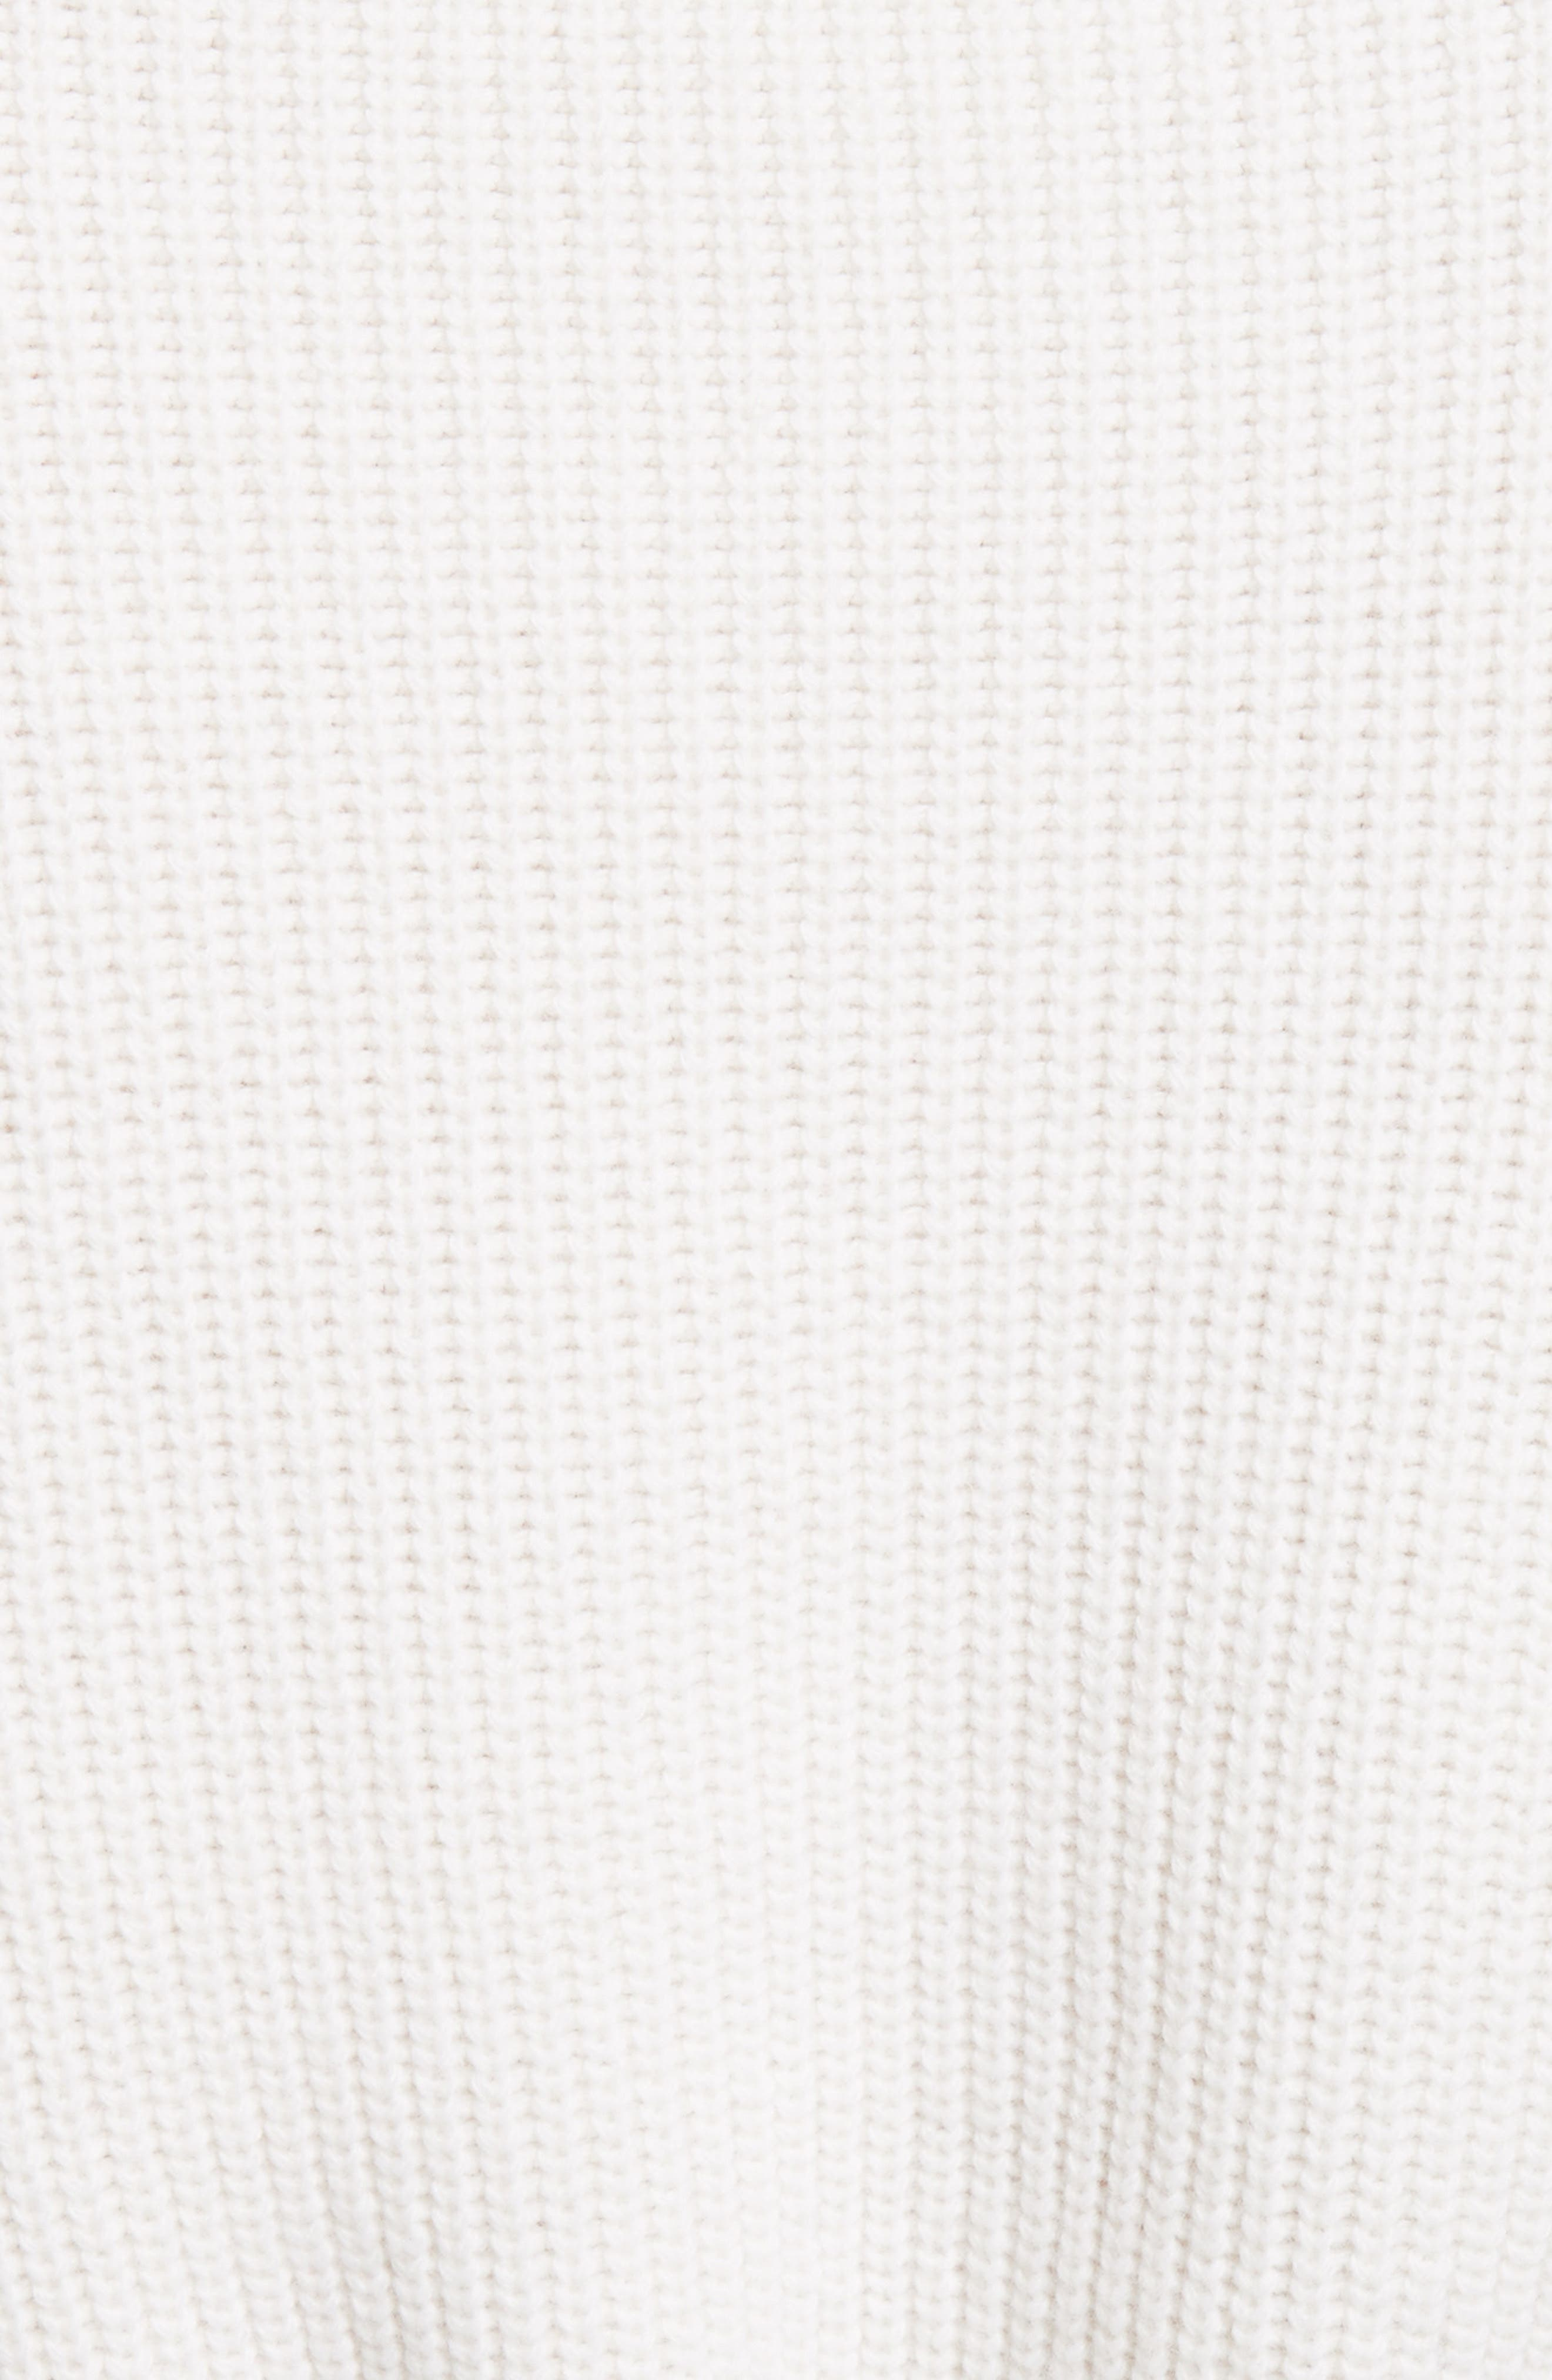 Alternate Image 3  - Chloé Lace Trim Merino Wool & Cashmere Sweater